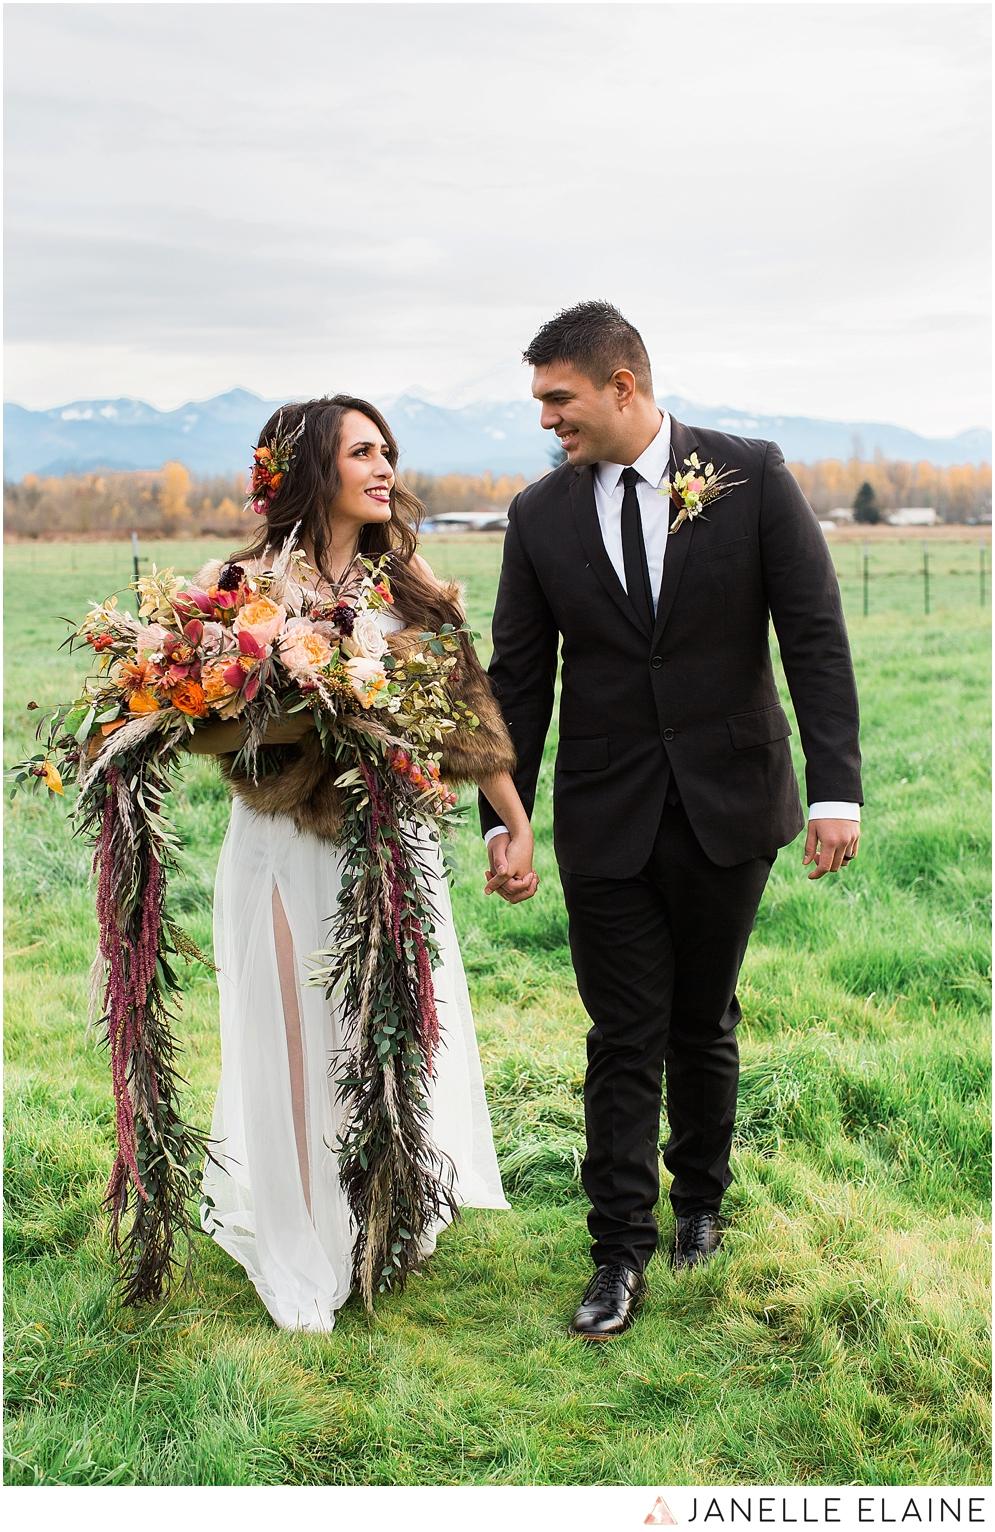 elopement-wedding-photographer-seattle washington-photographers-47.jpg